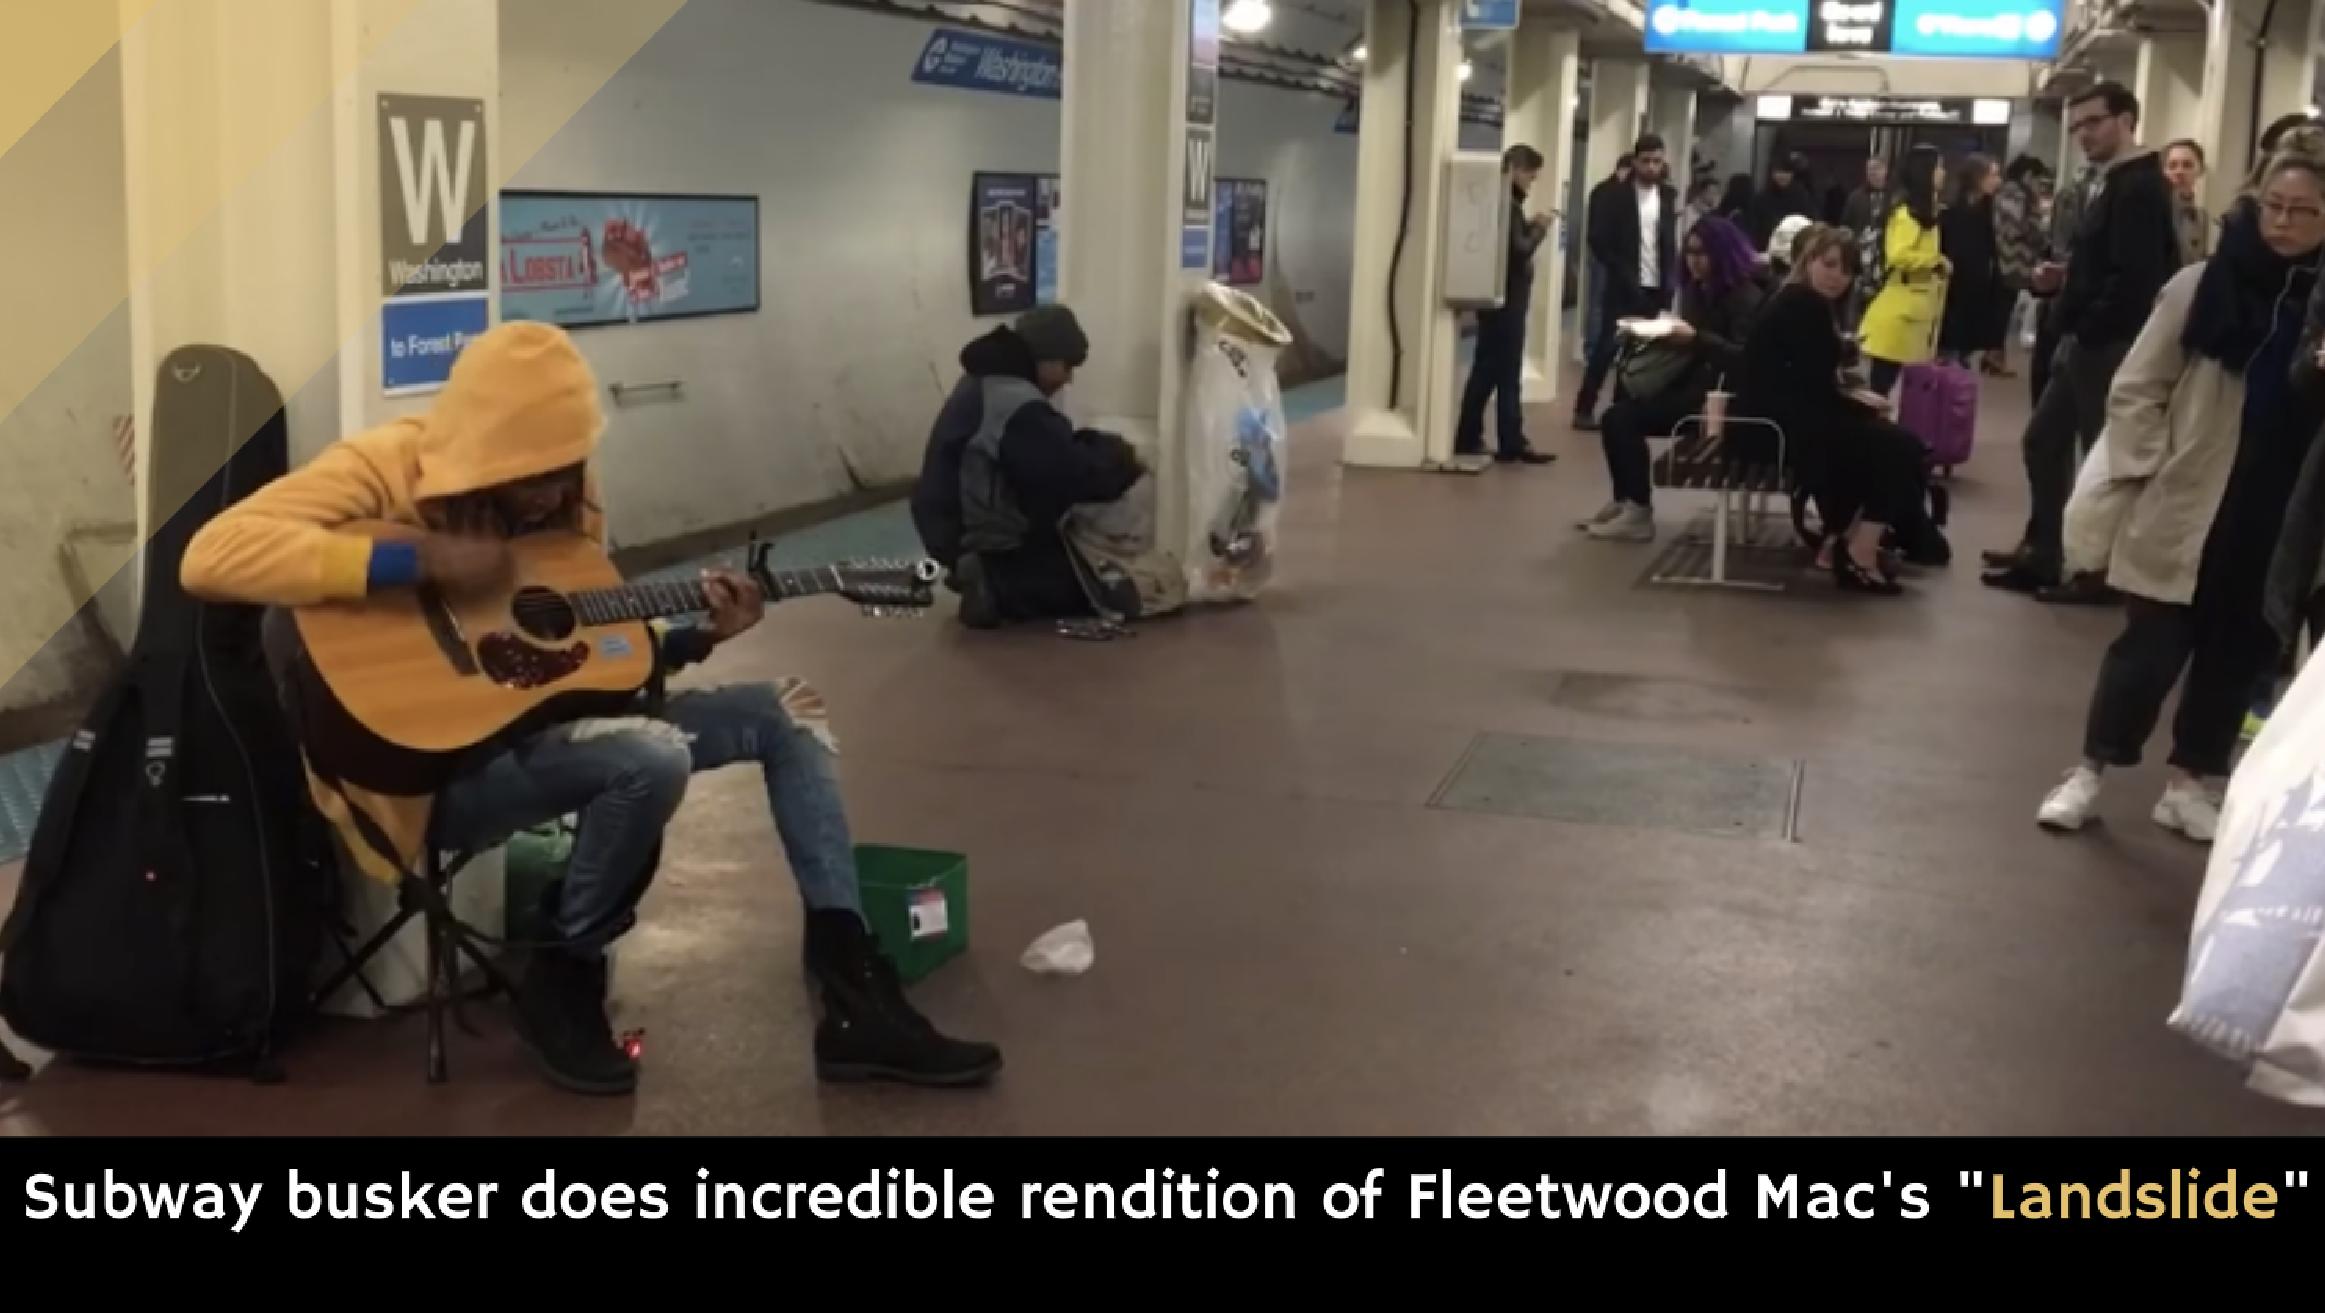 Subway Busker Does Incredible Rendition Of Fleetwood Macs